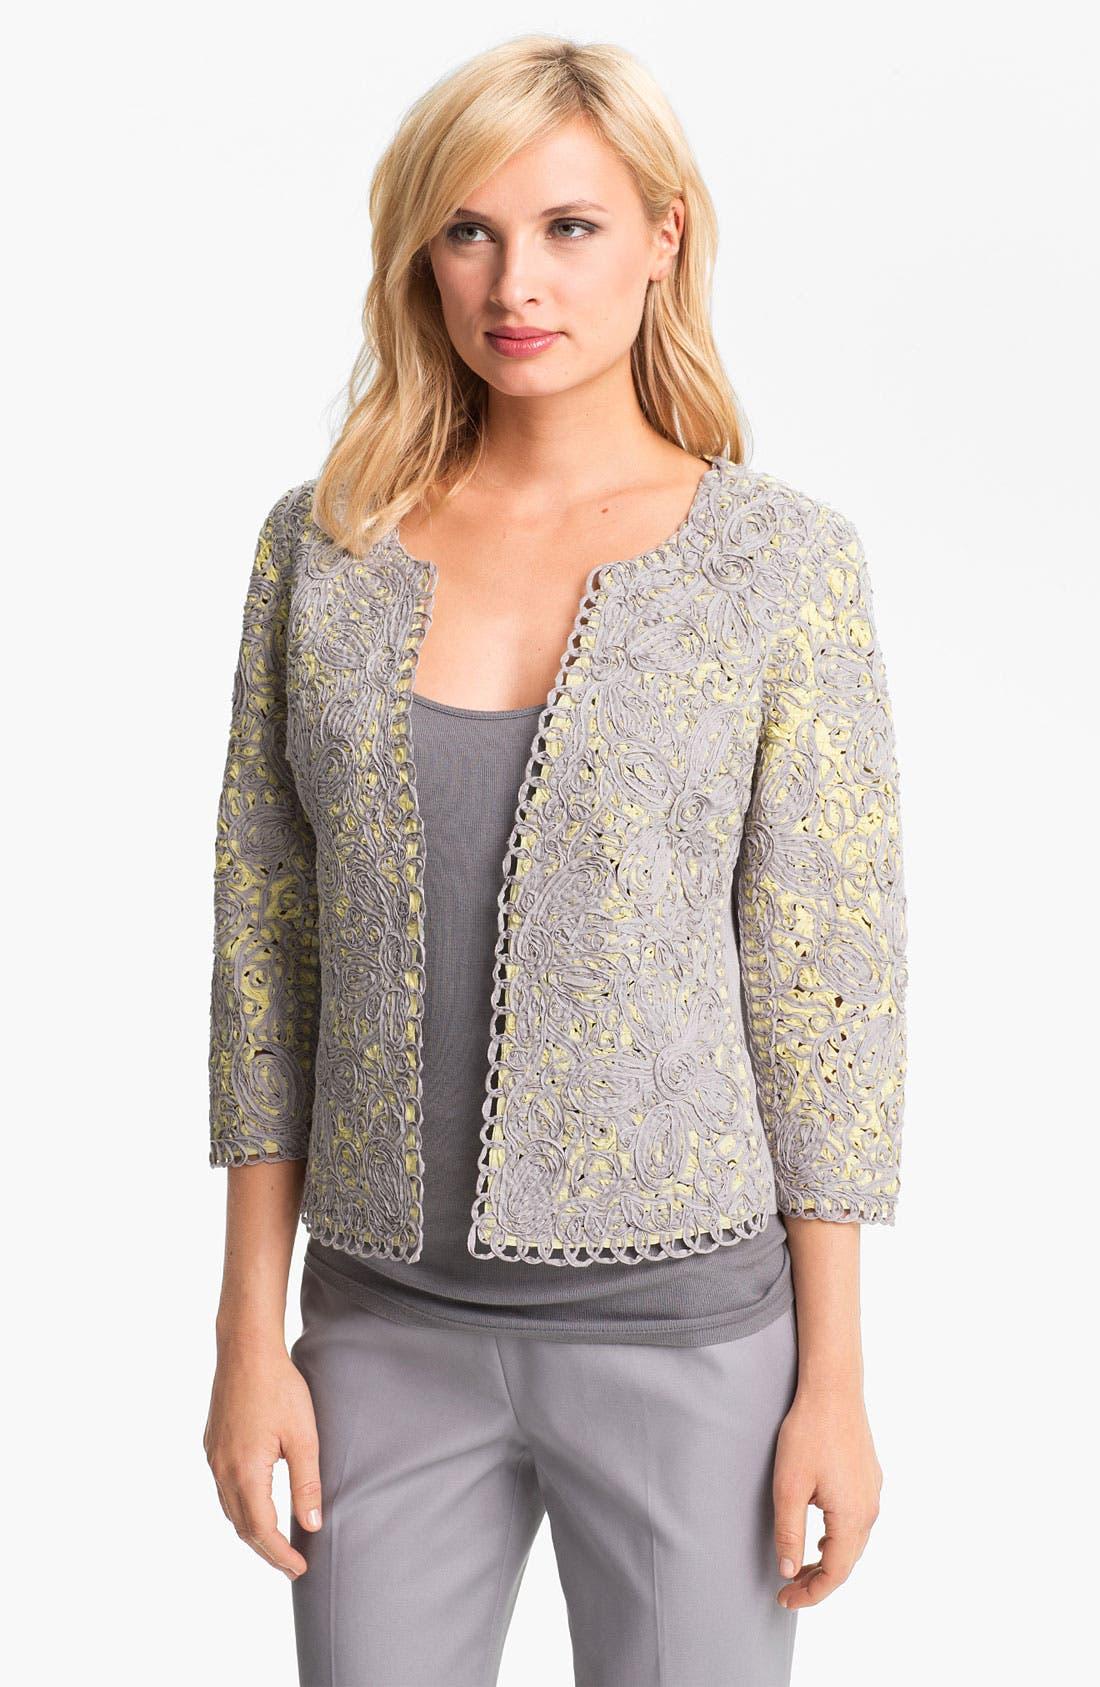 Alternate Image 1 Selected - Nic + Zoe Two Tone Lace Jacket (Petite)